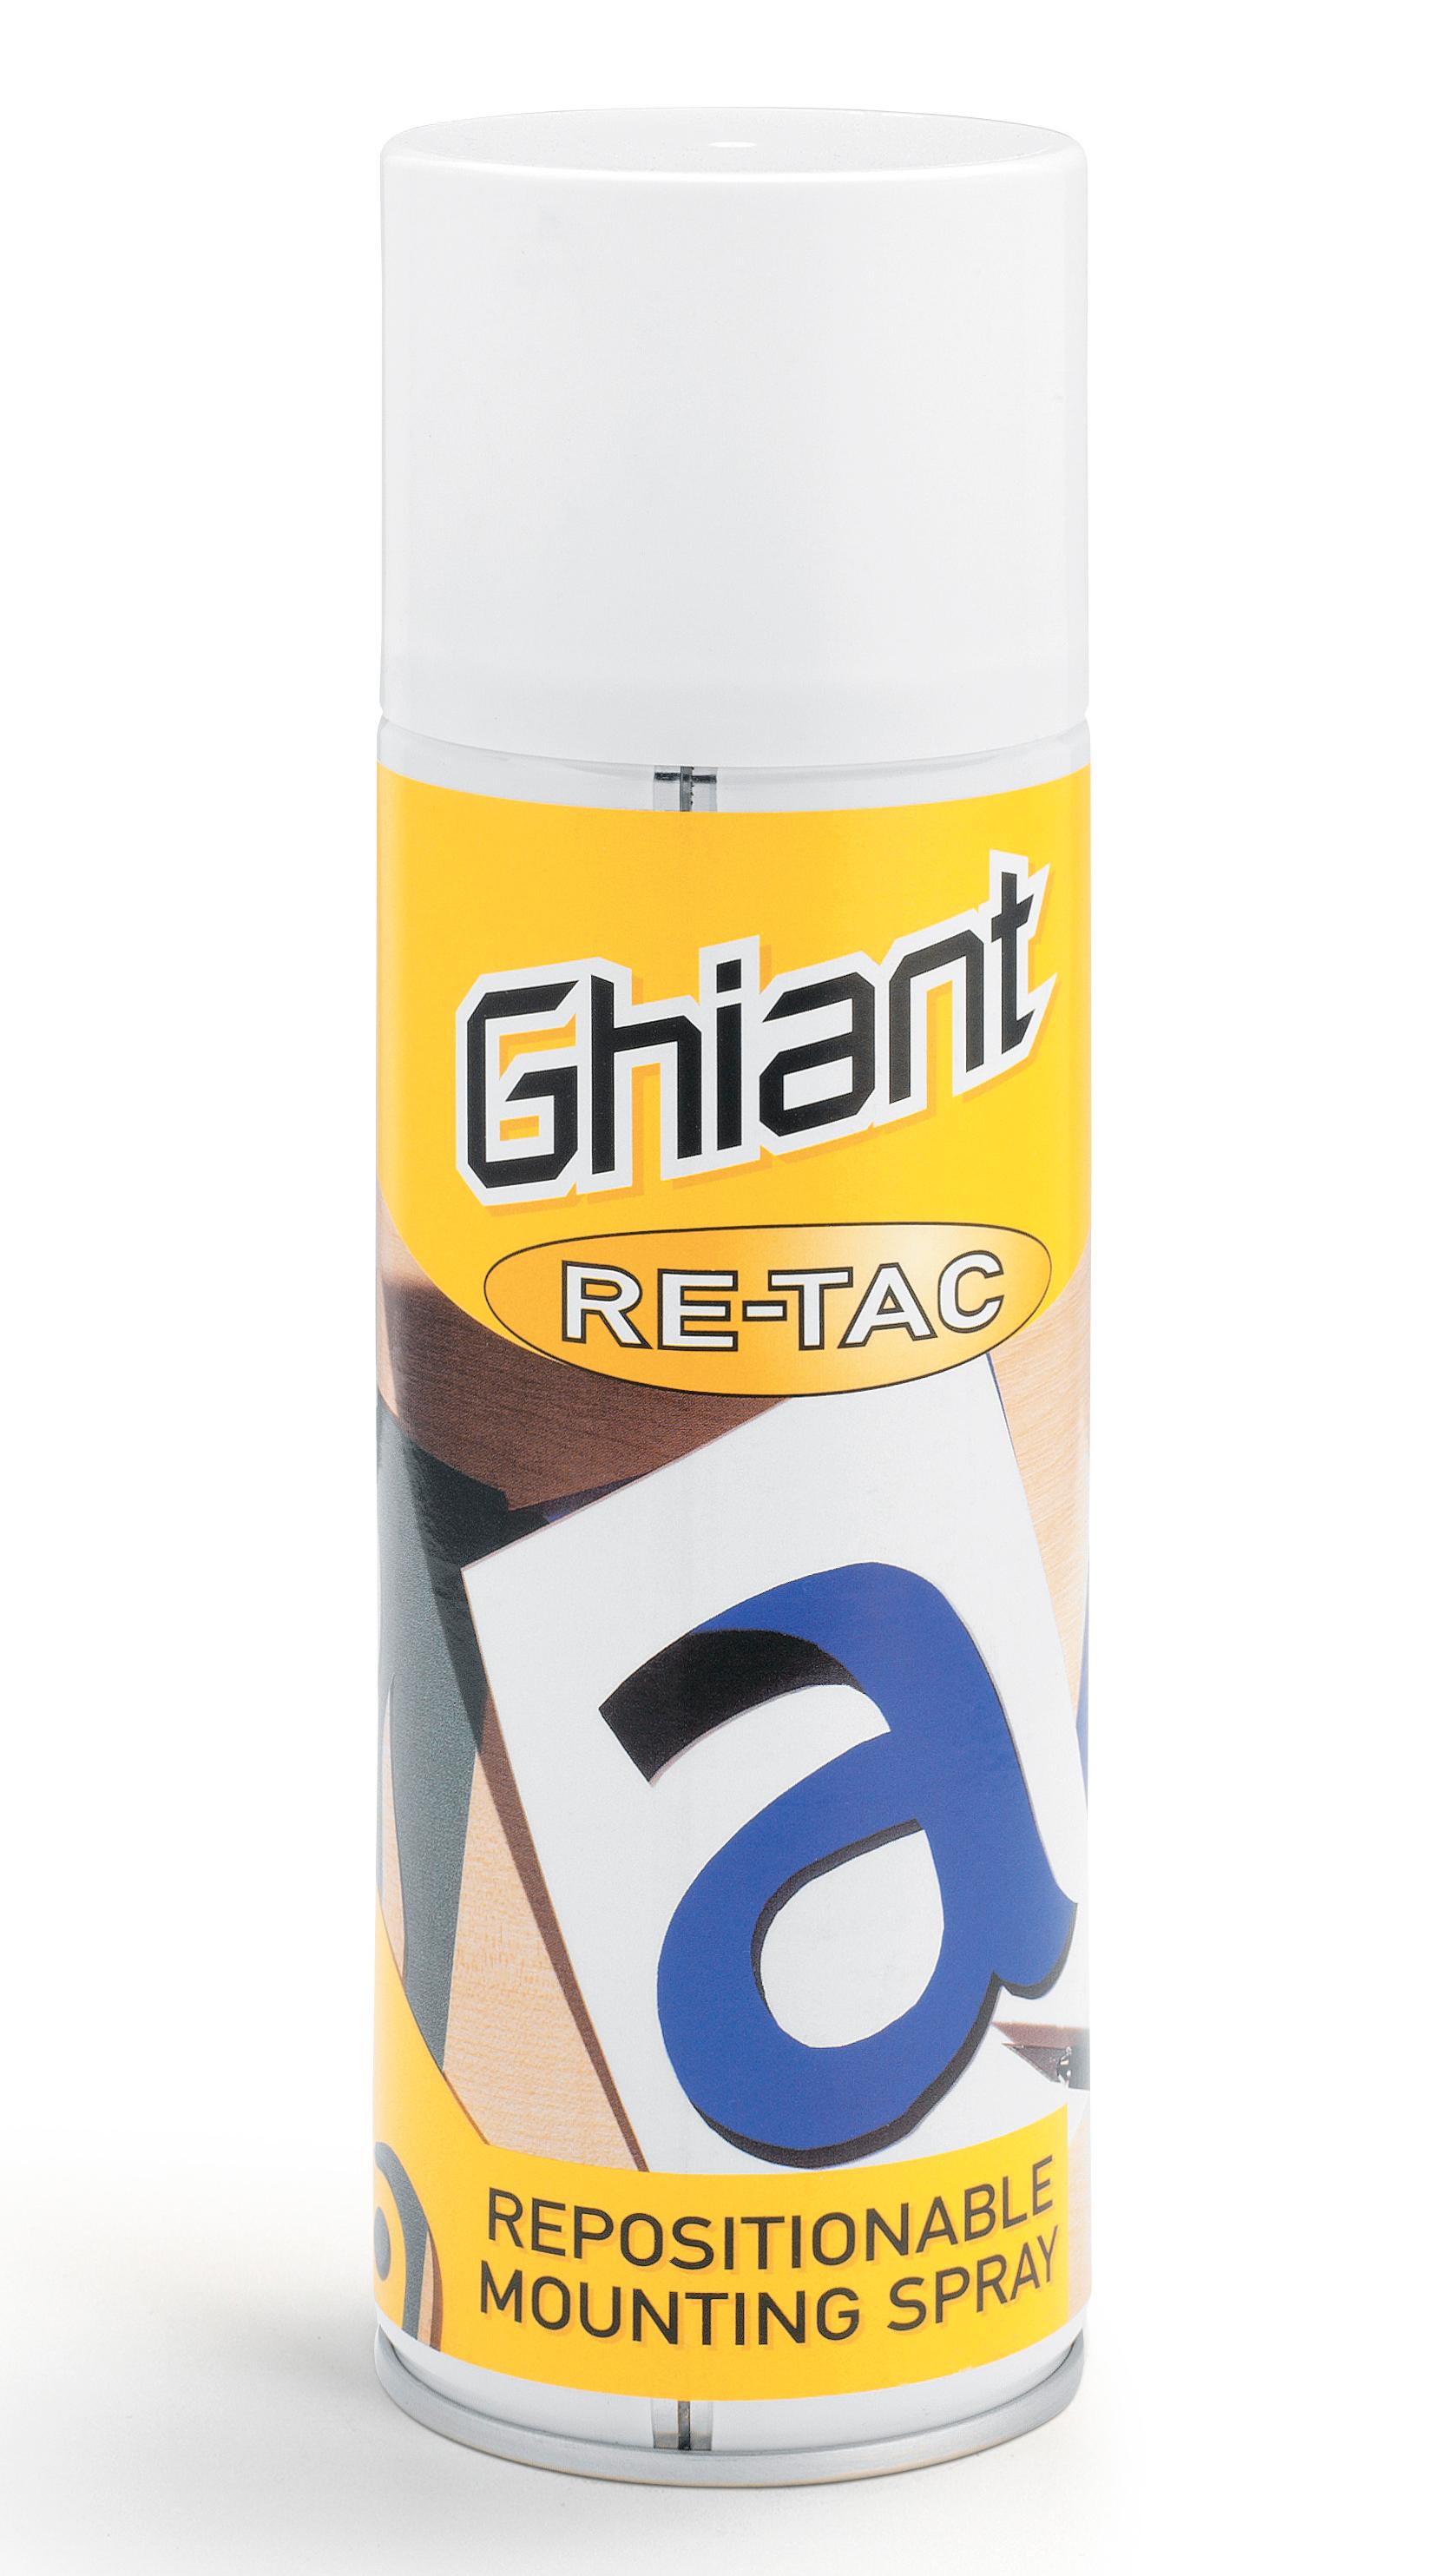 Ghiant-Re-Tac